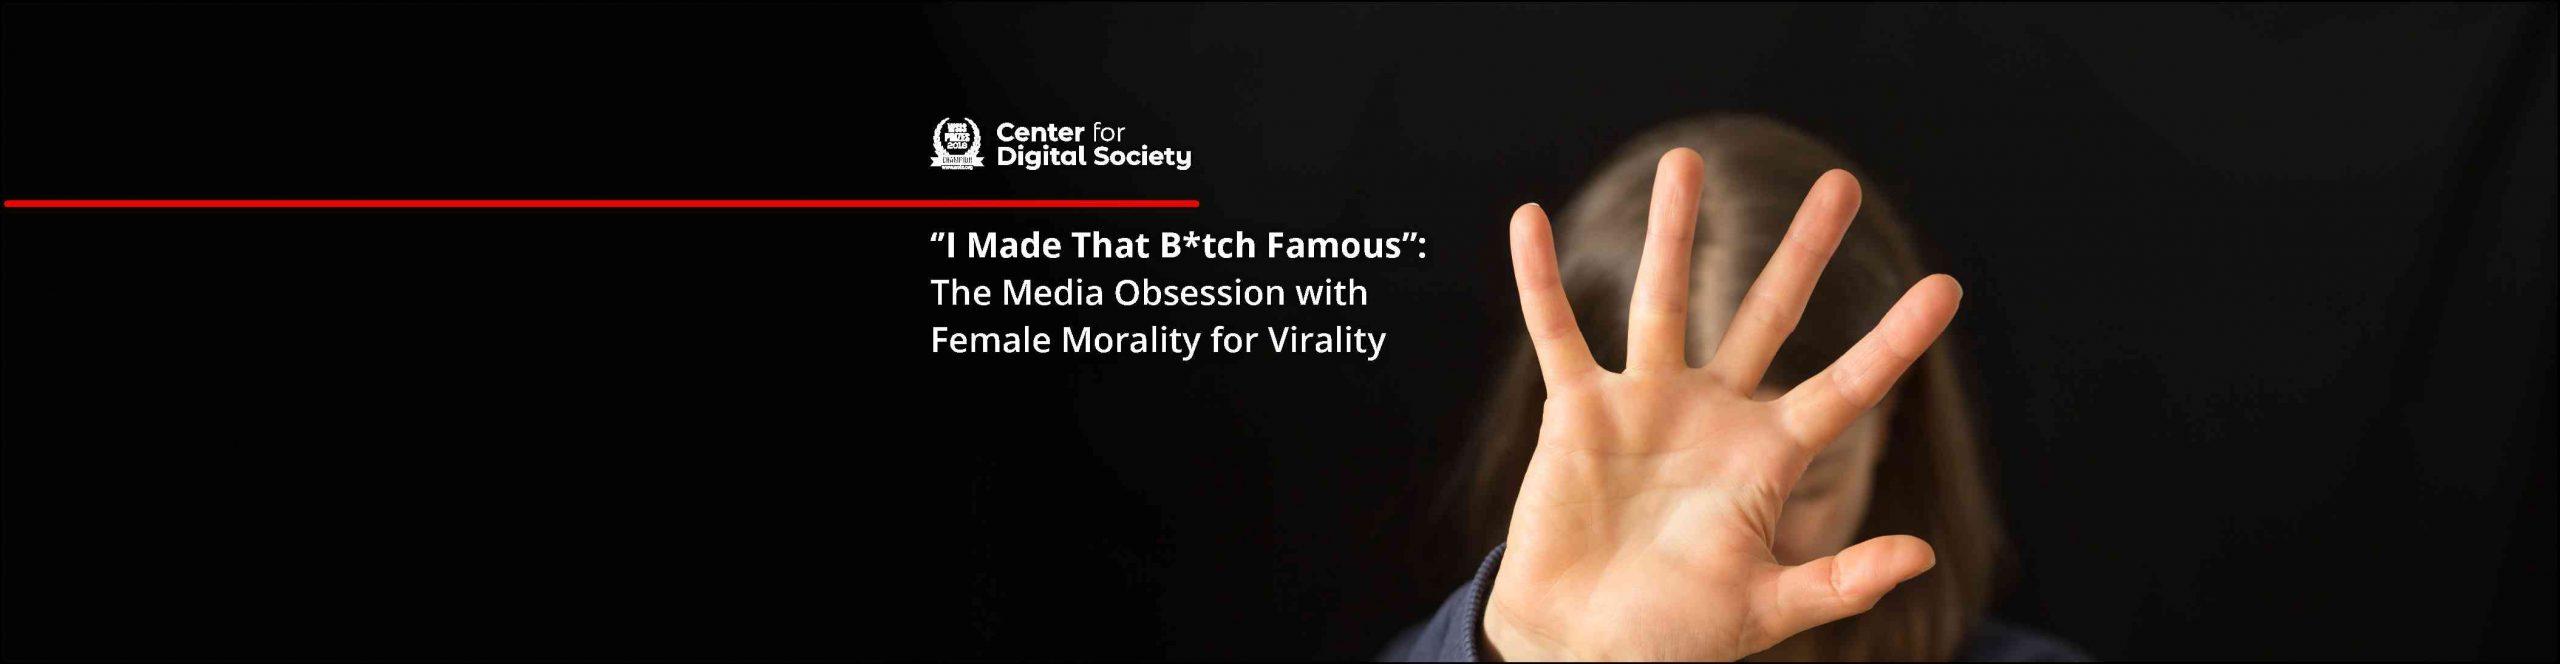 """I Made That B*tch Famous"": Obsesi Media terhadap Moralitas Perempuan demi Viralitas"